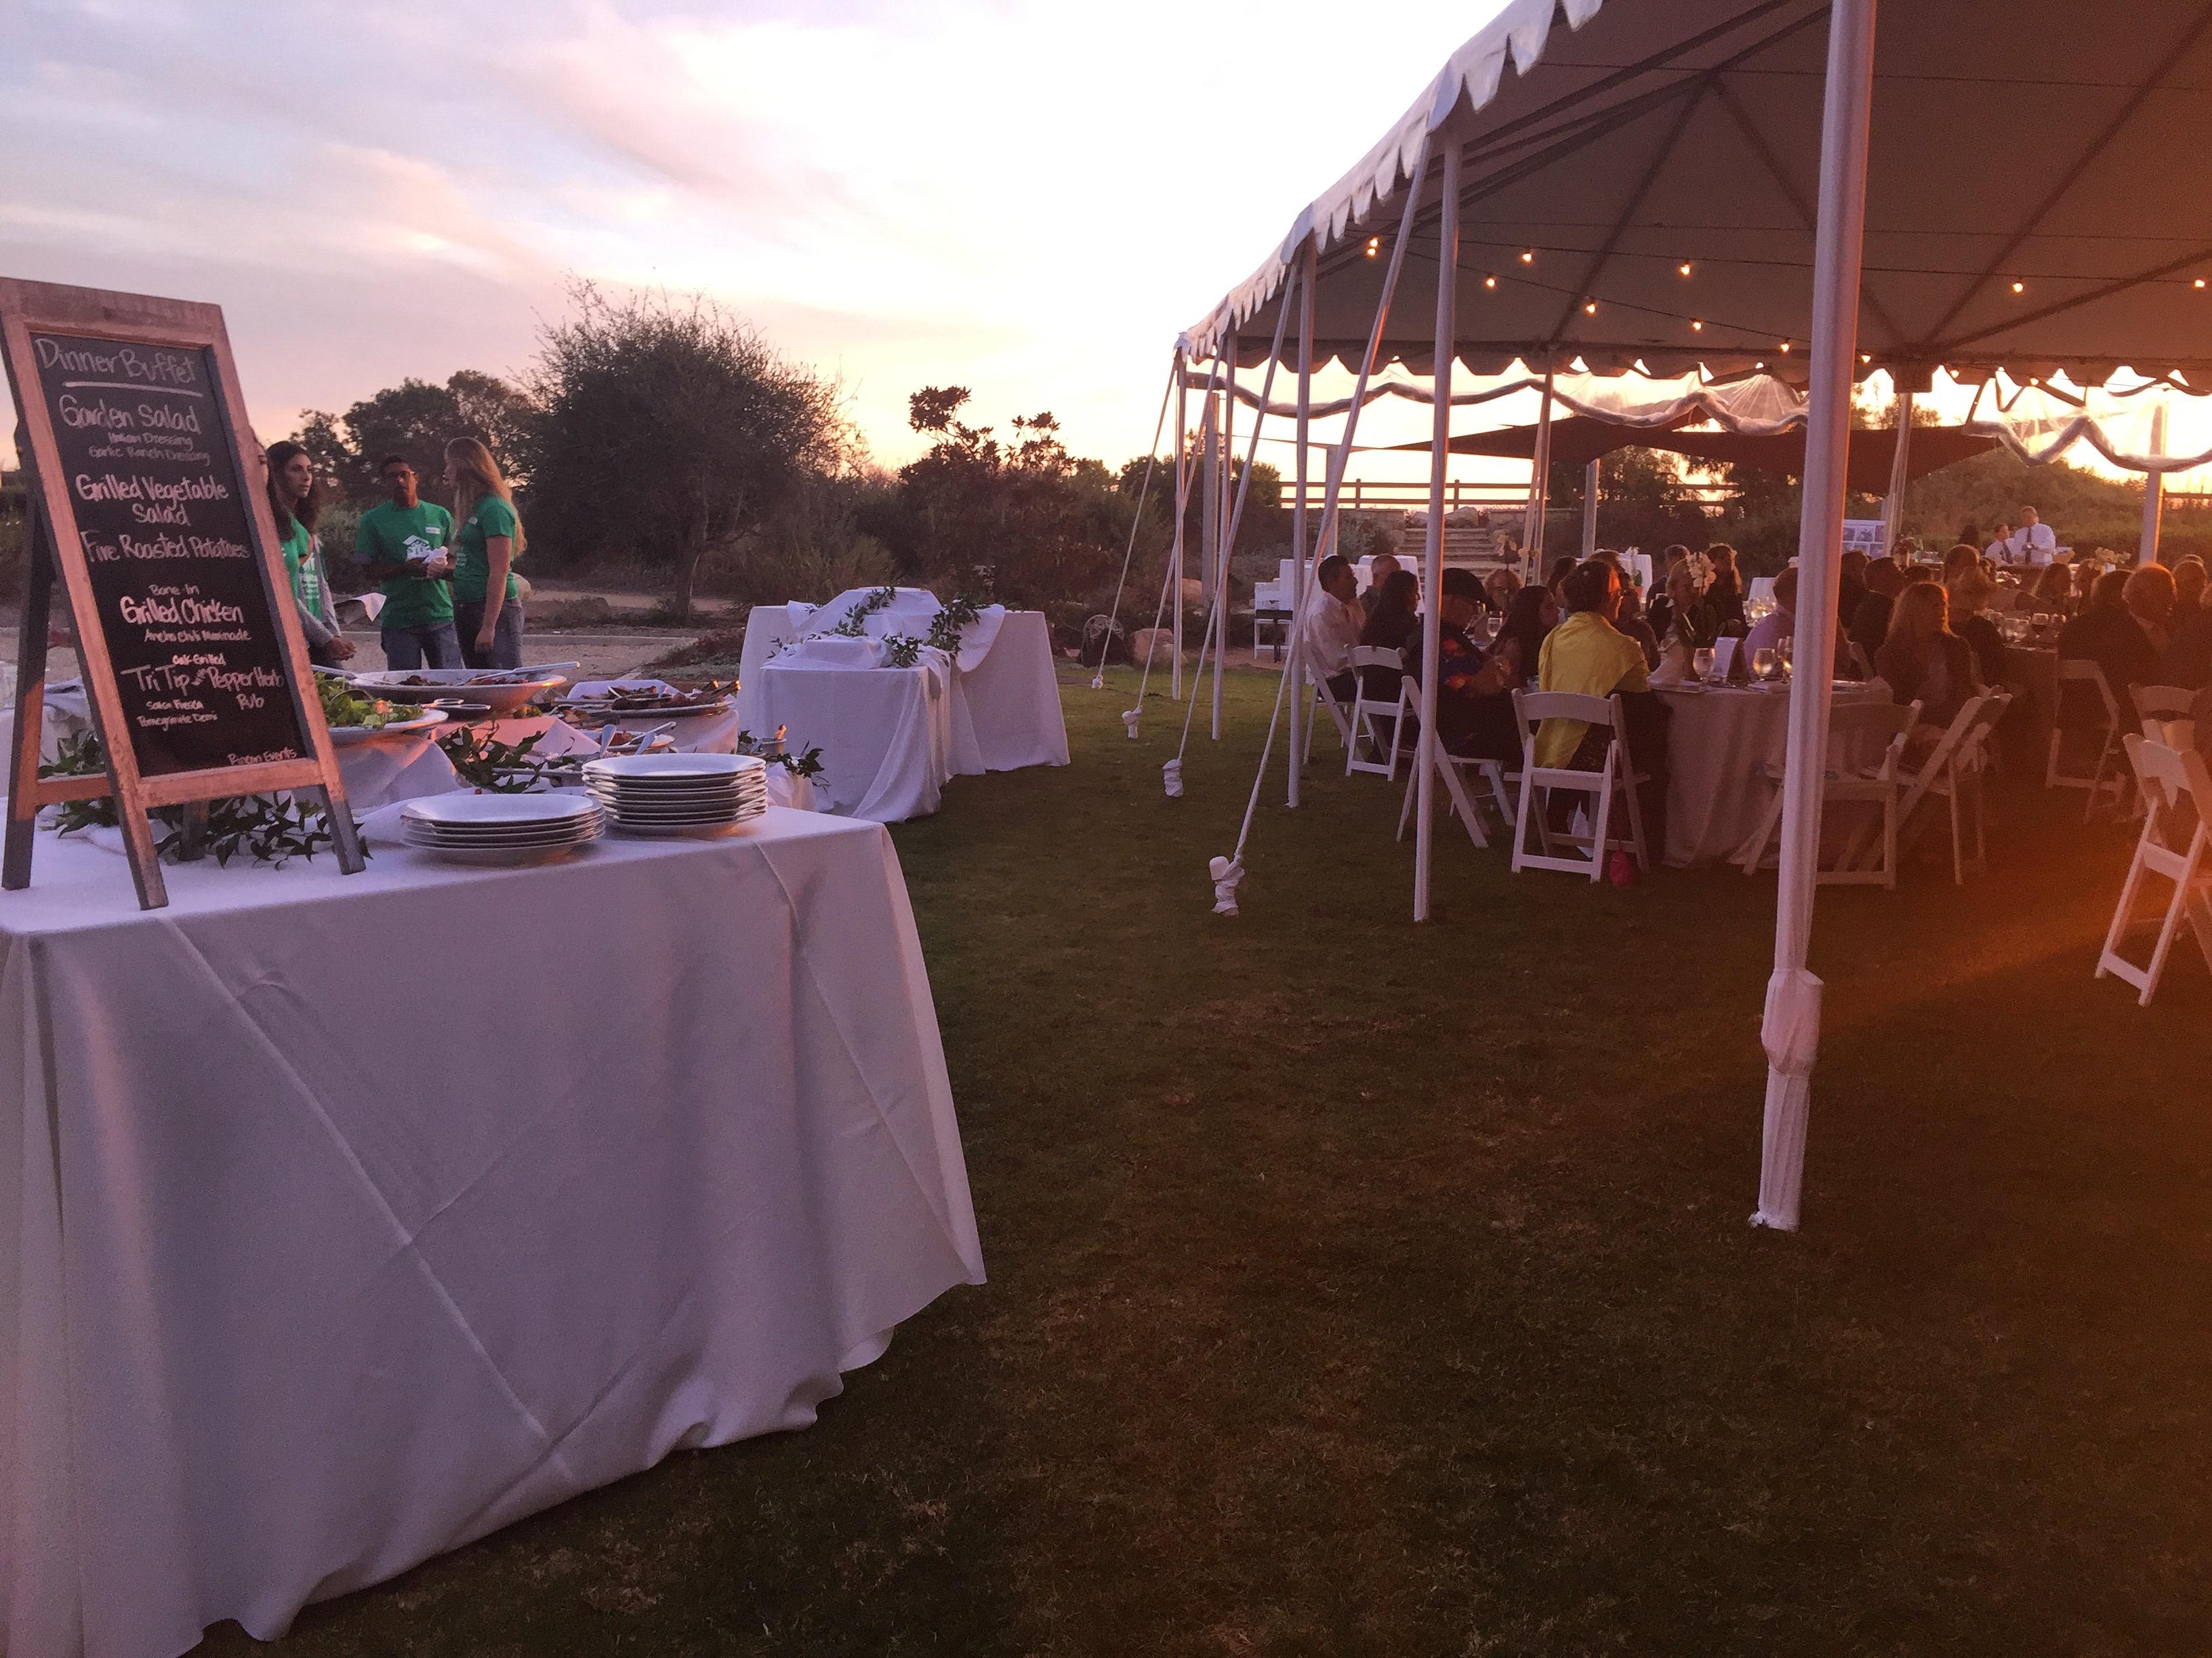 Denim & Diamonds gala at Procore for Habitat for Humanity Santa Barbara